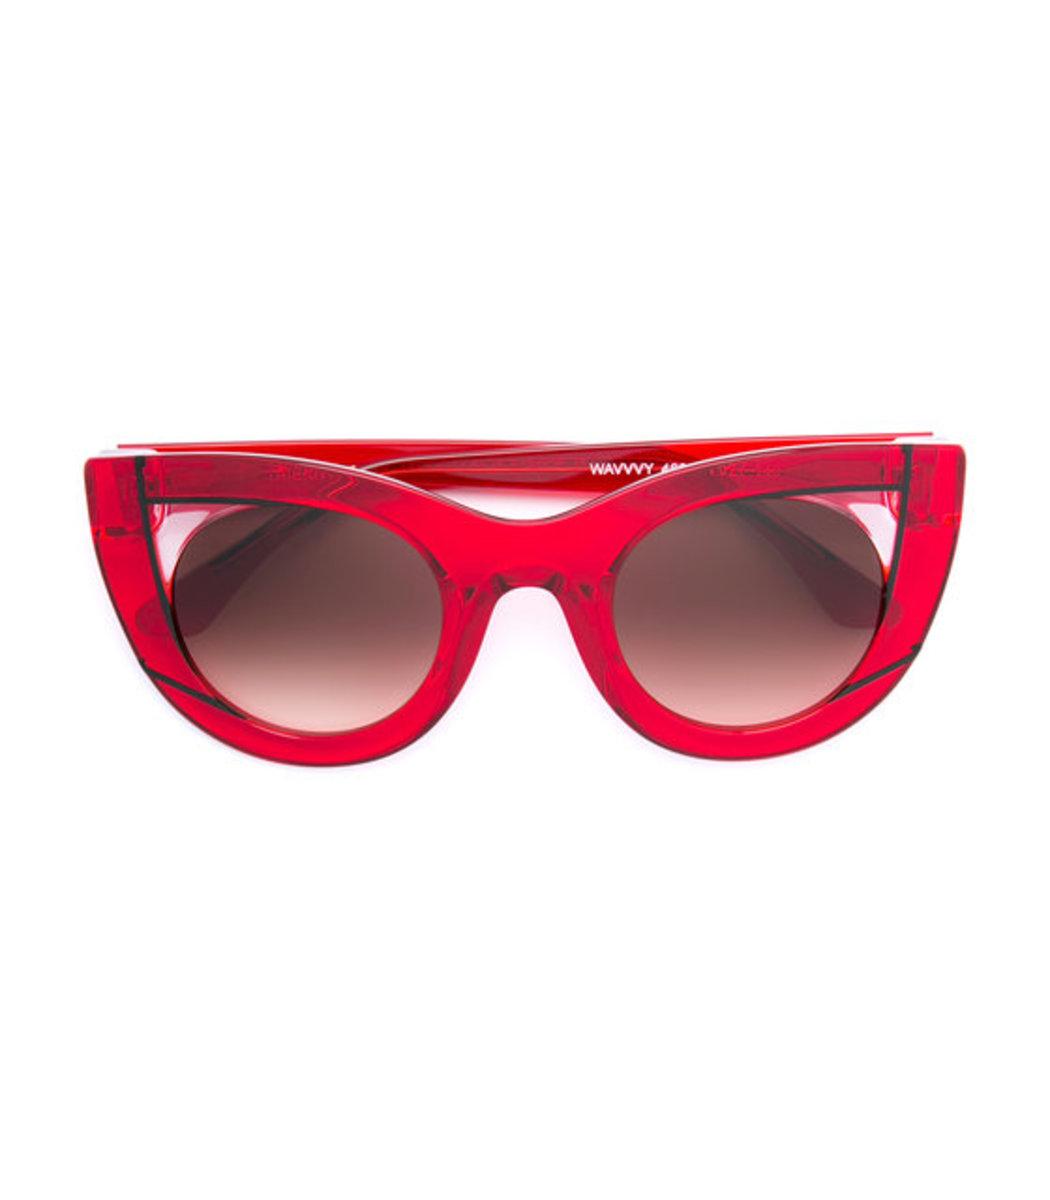 bb2e88f32e THIERRY LASRY Hedony Cat-Eye Acetate Sunglasses